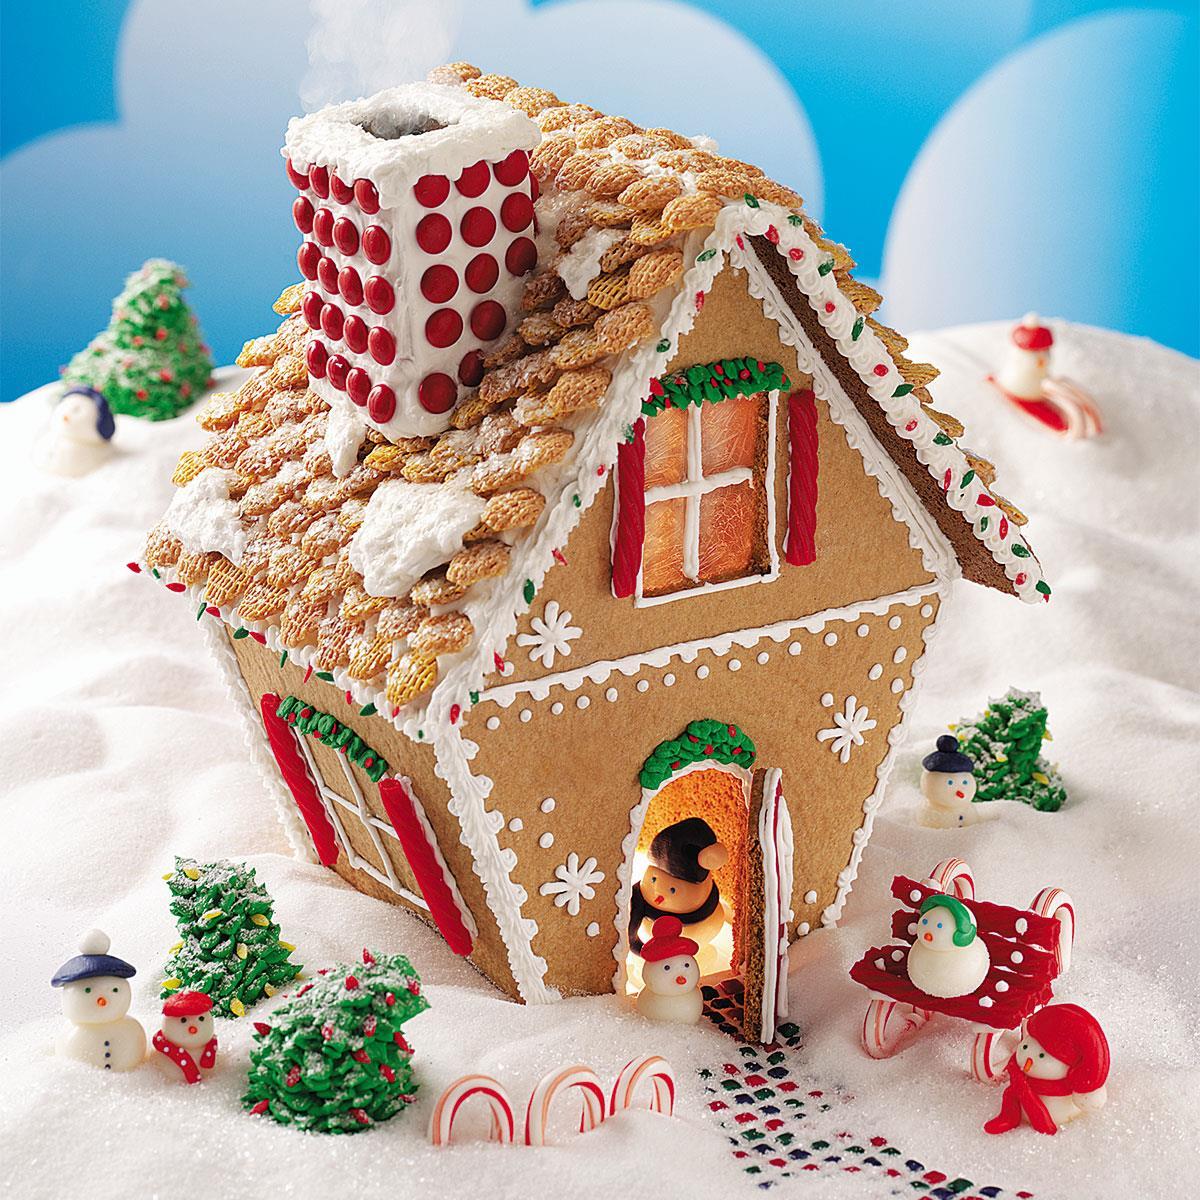 Gingerbread Home Decor: Winter Wonderland Gingerbread Cottage Recipe